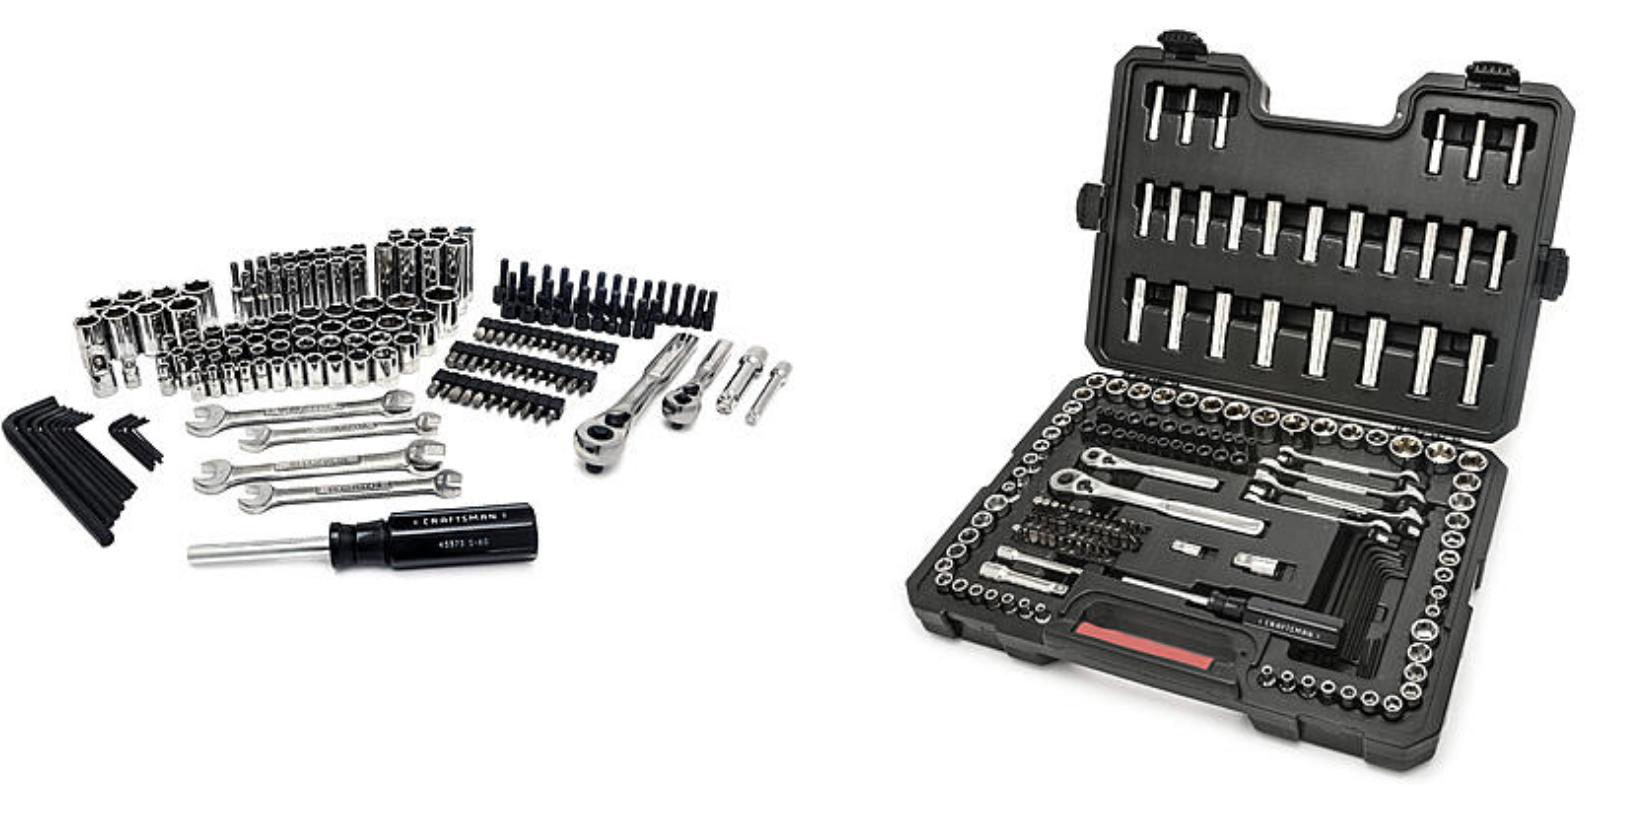 Sears Craftsman 165pc Mechanics Tool Set - $37.86 + tax, free shipping